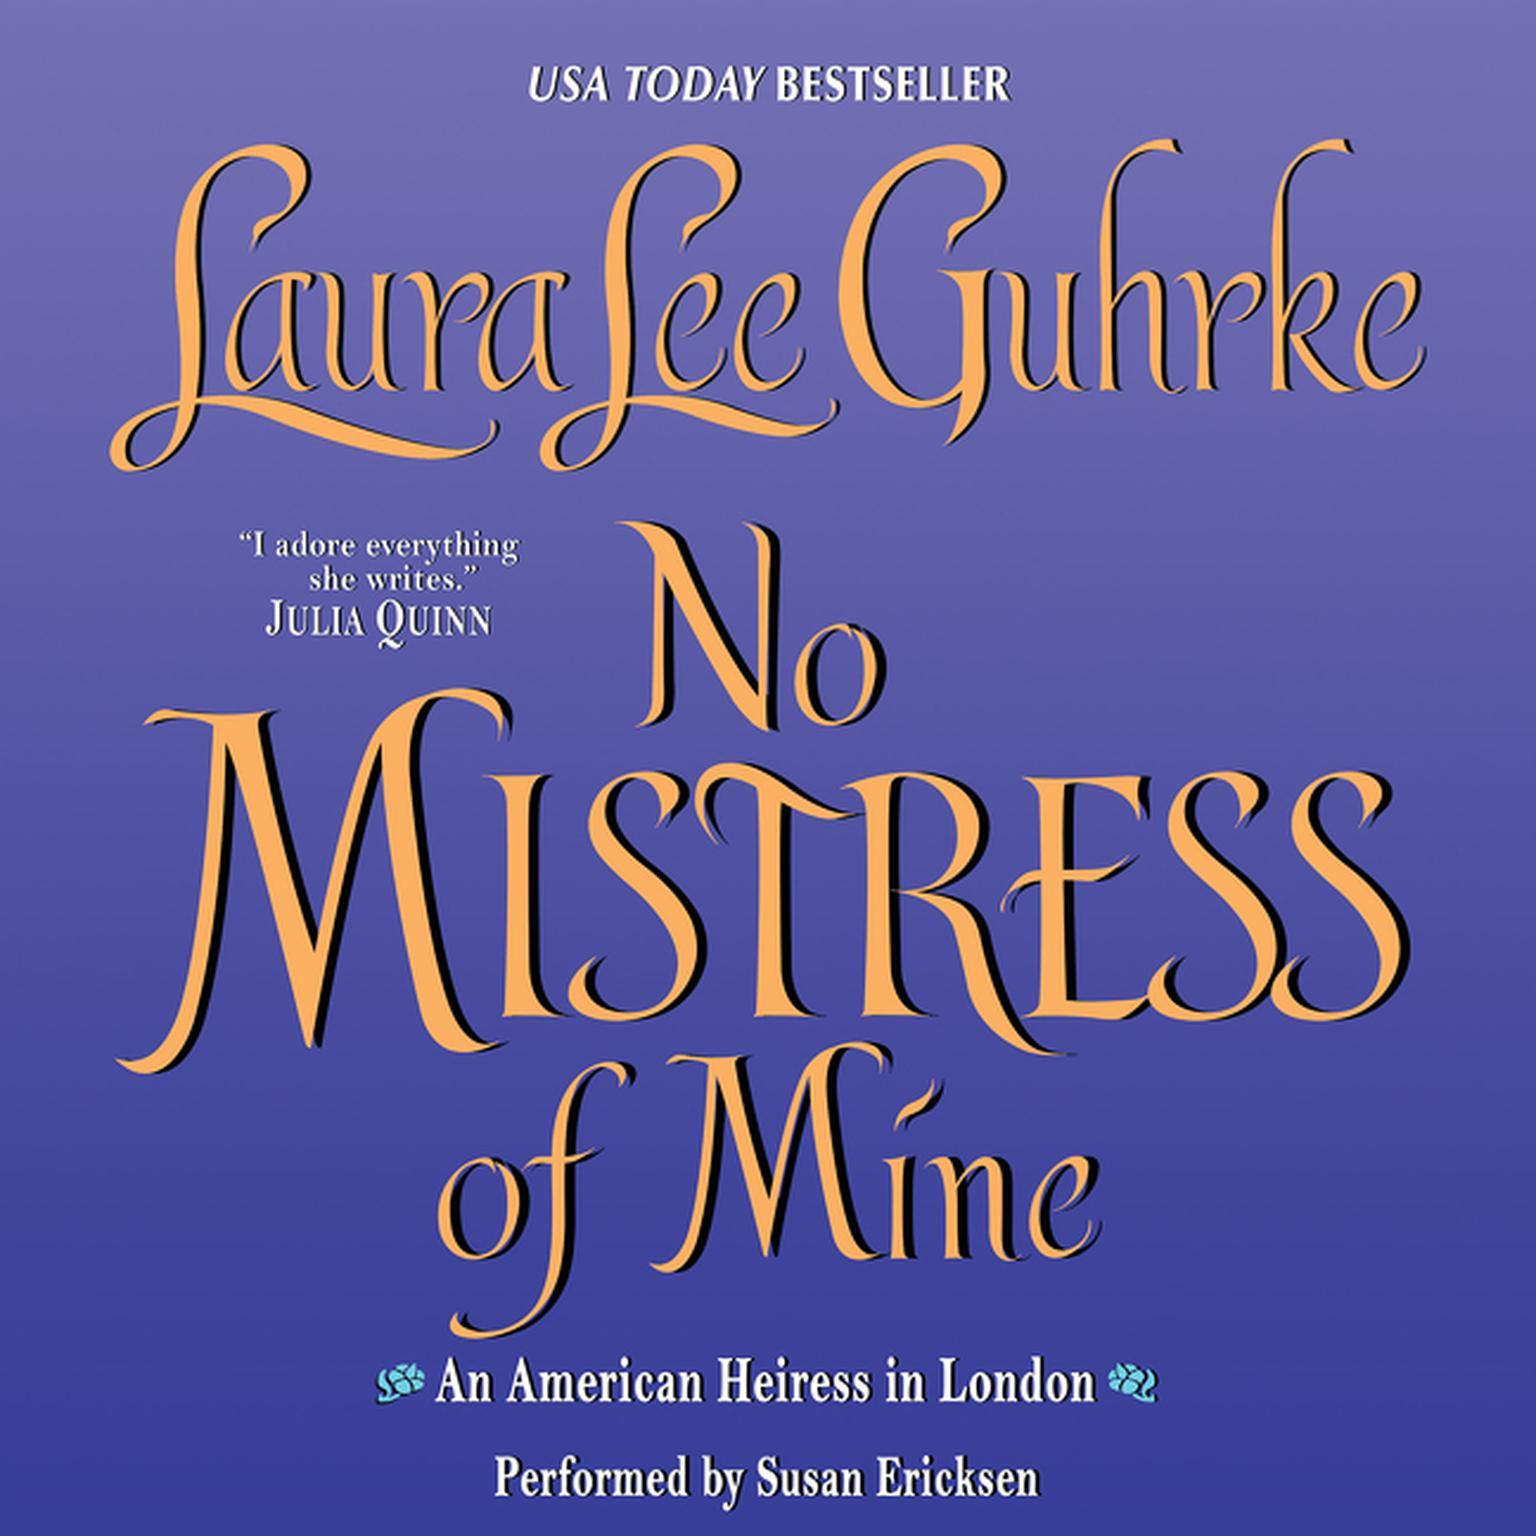 No Mistress of Mine: An American Heiress in London Audiobook, by Laura Lee Guhrke